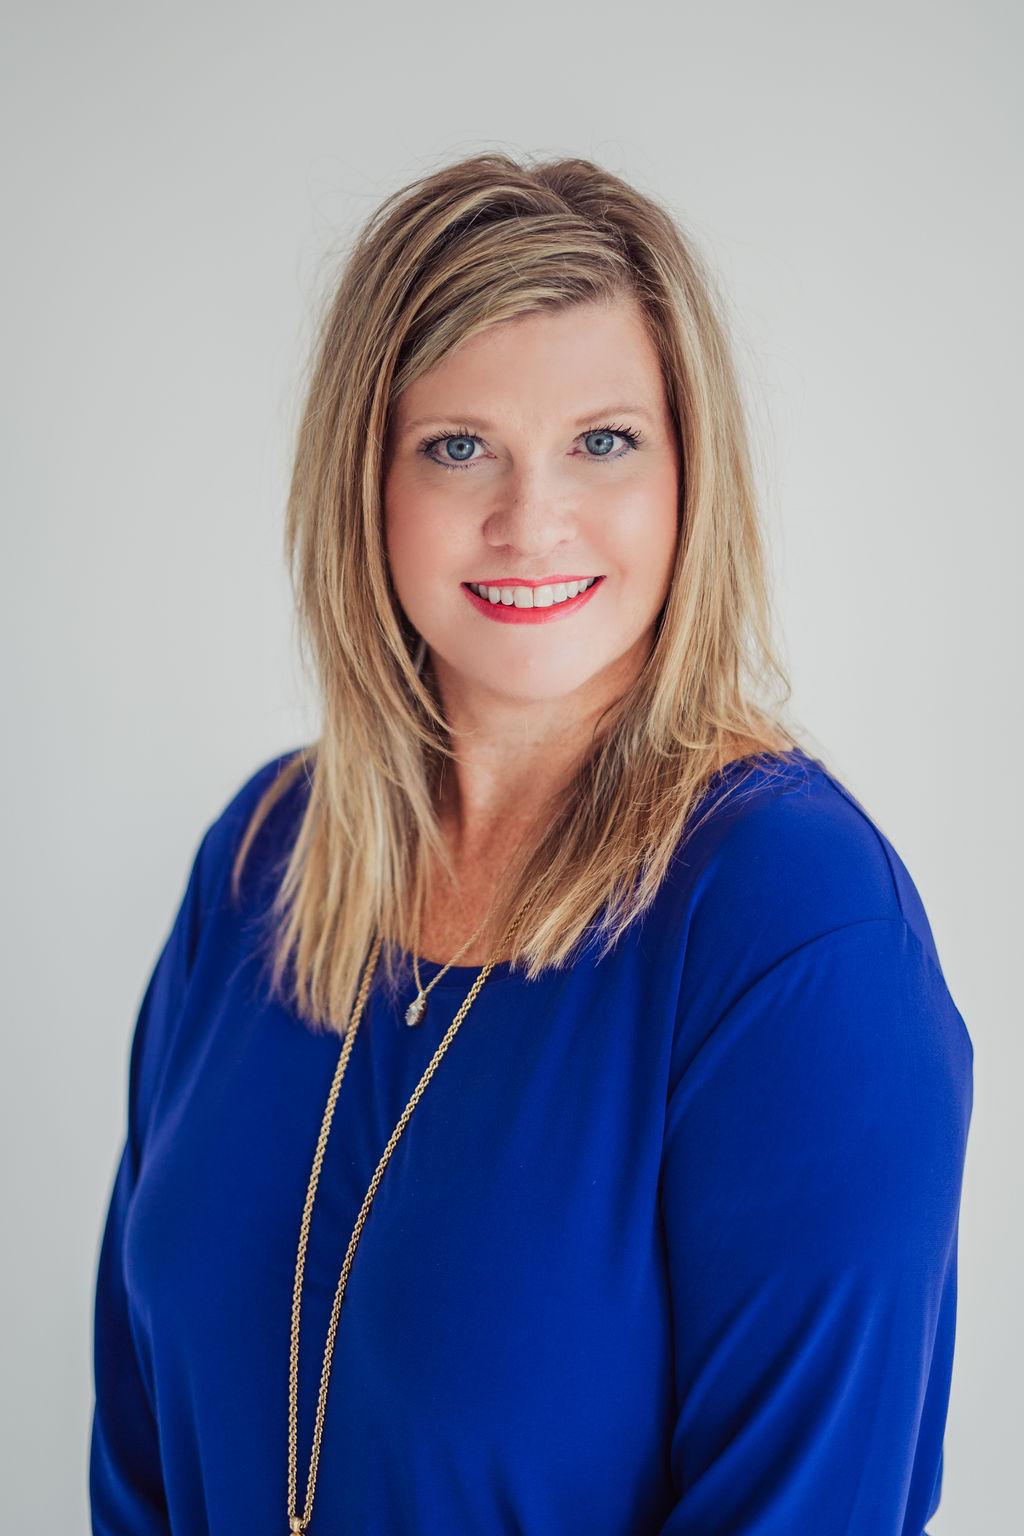 Christy Holt